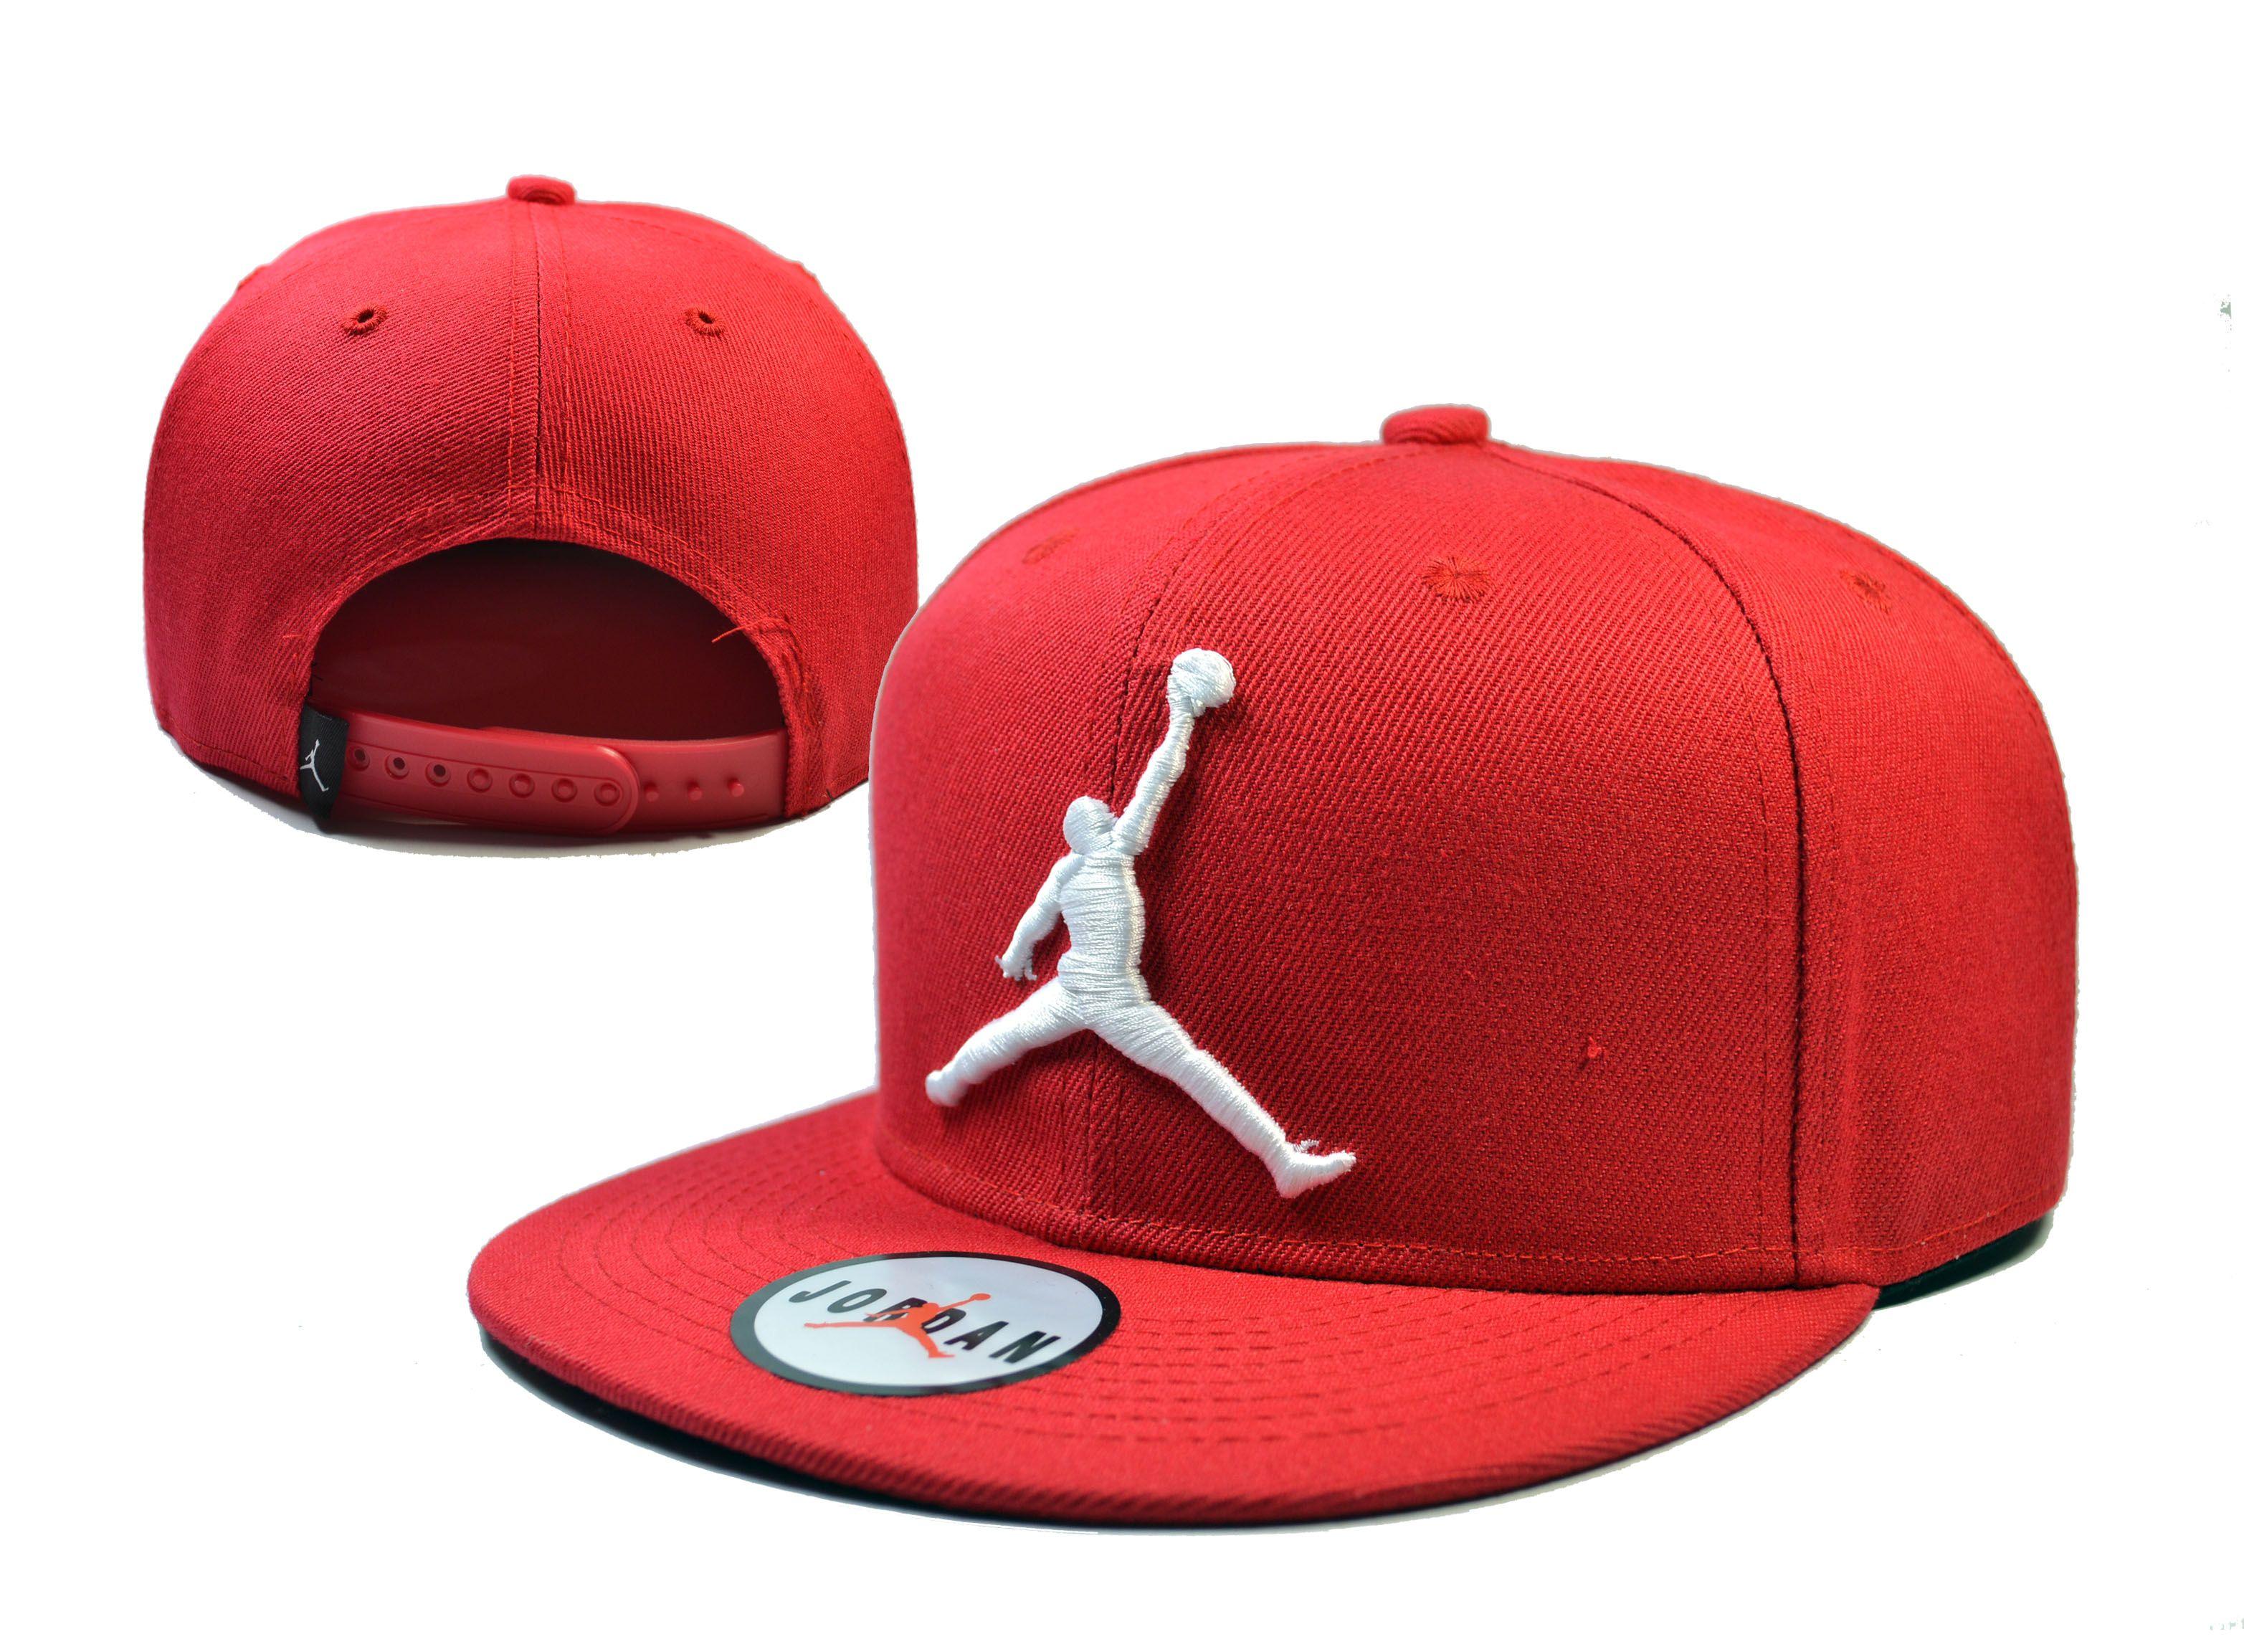 detailed look dc110 8363b Jordan Snapback Hats Red 157